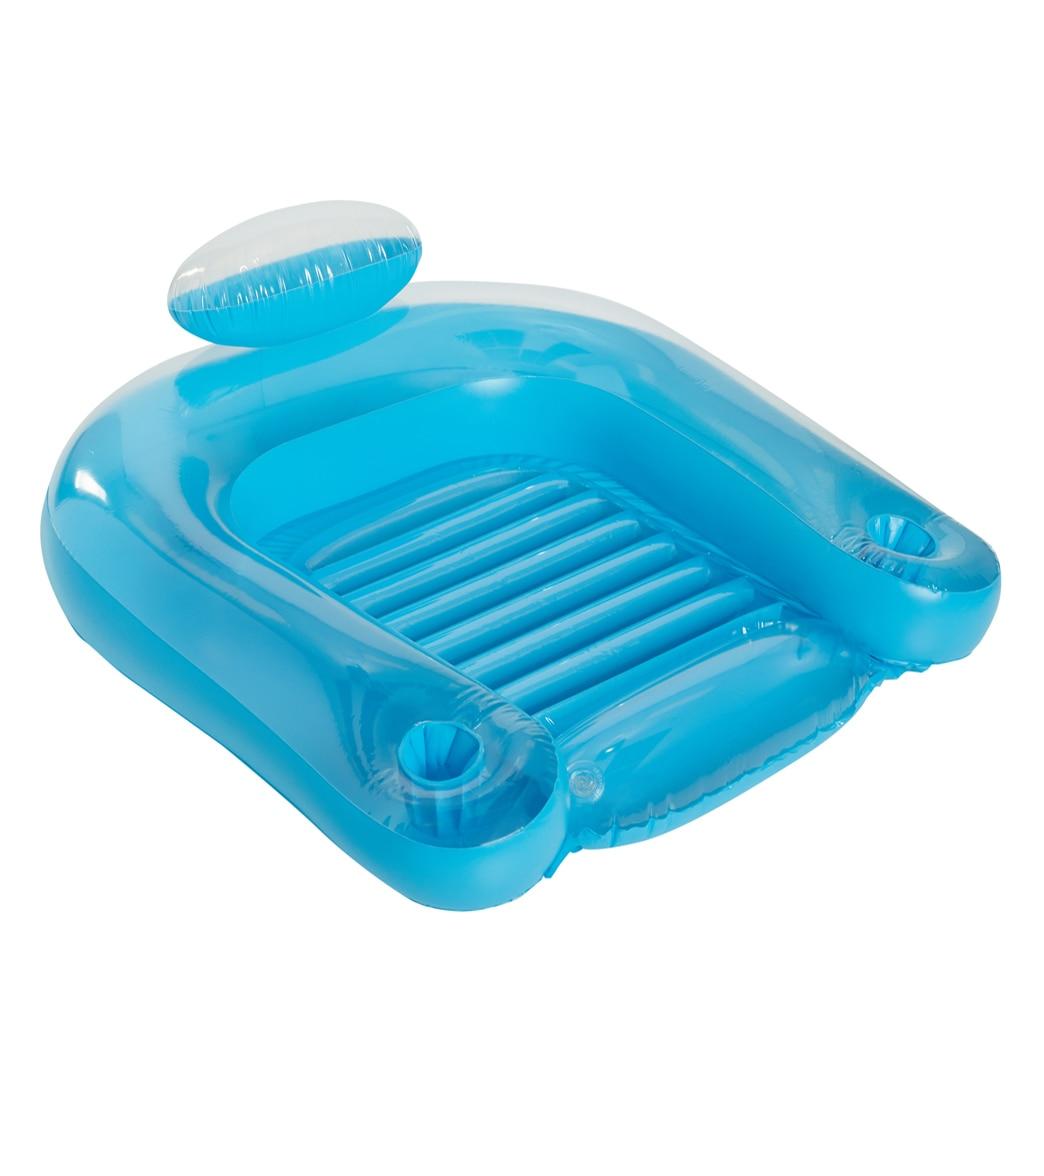 Superbe Poolmaster Paradise Chair Pool Float